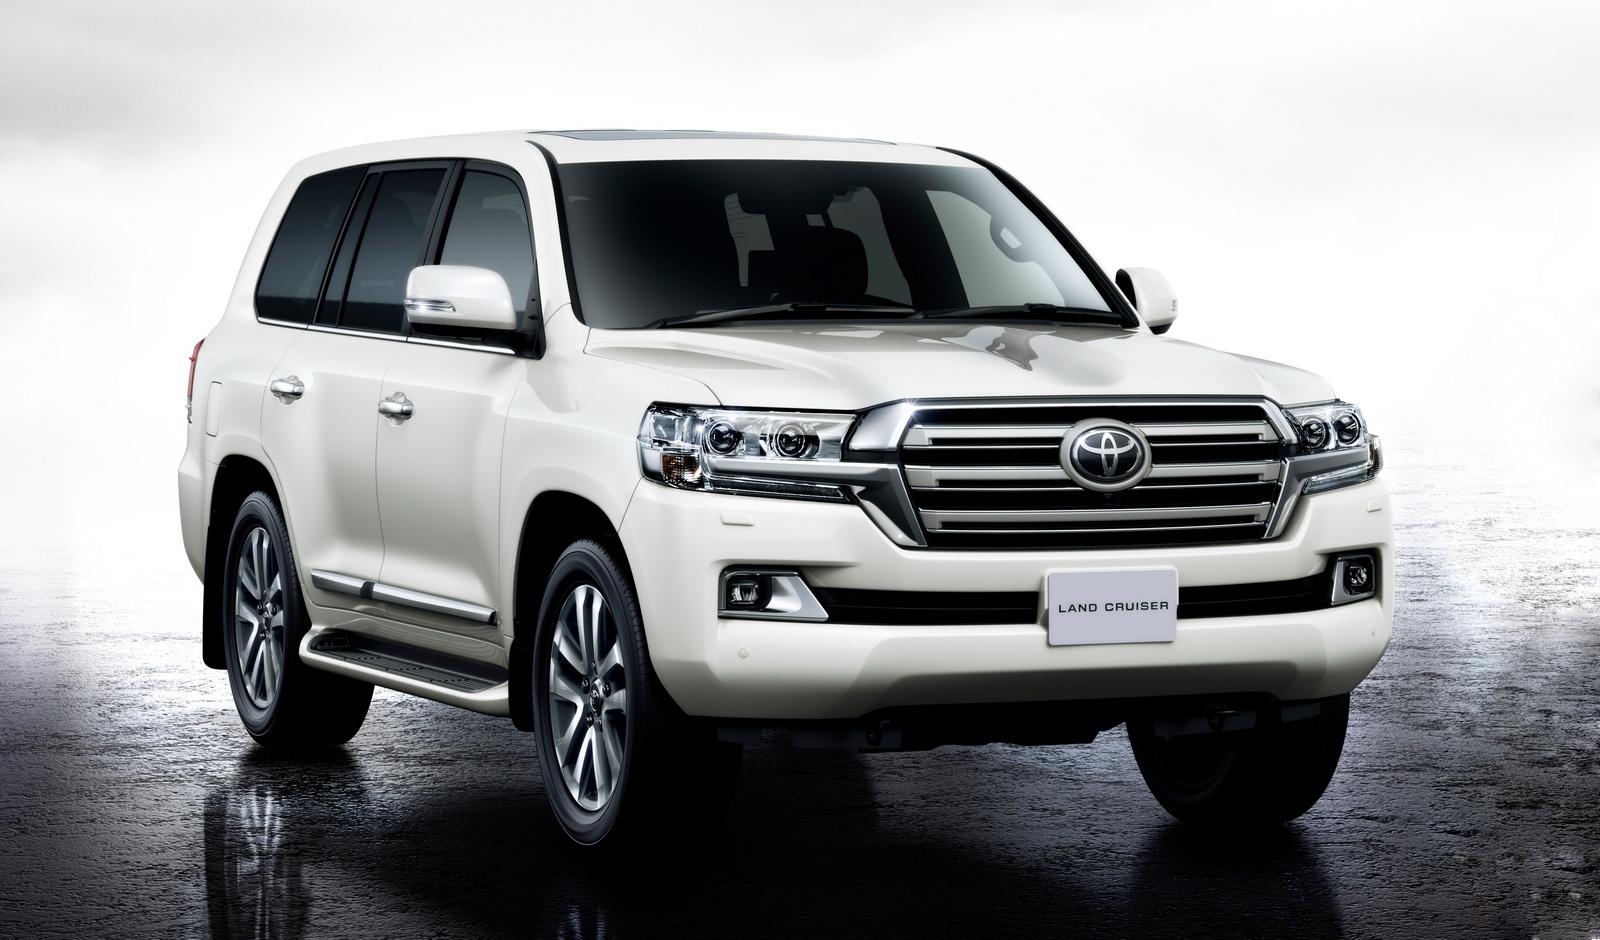 Toyota Land Cruiser Gxr 4 5l Diesel A T My17 Dazzle Uae